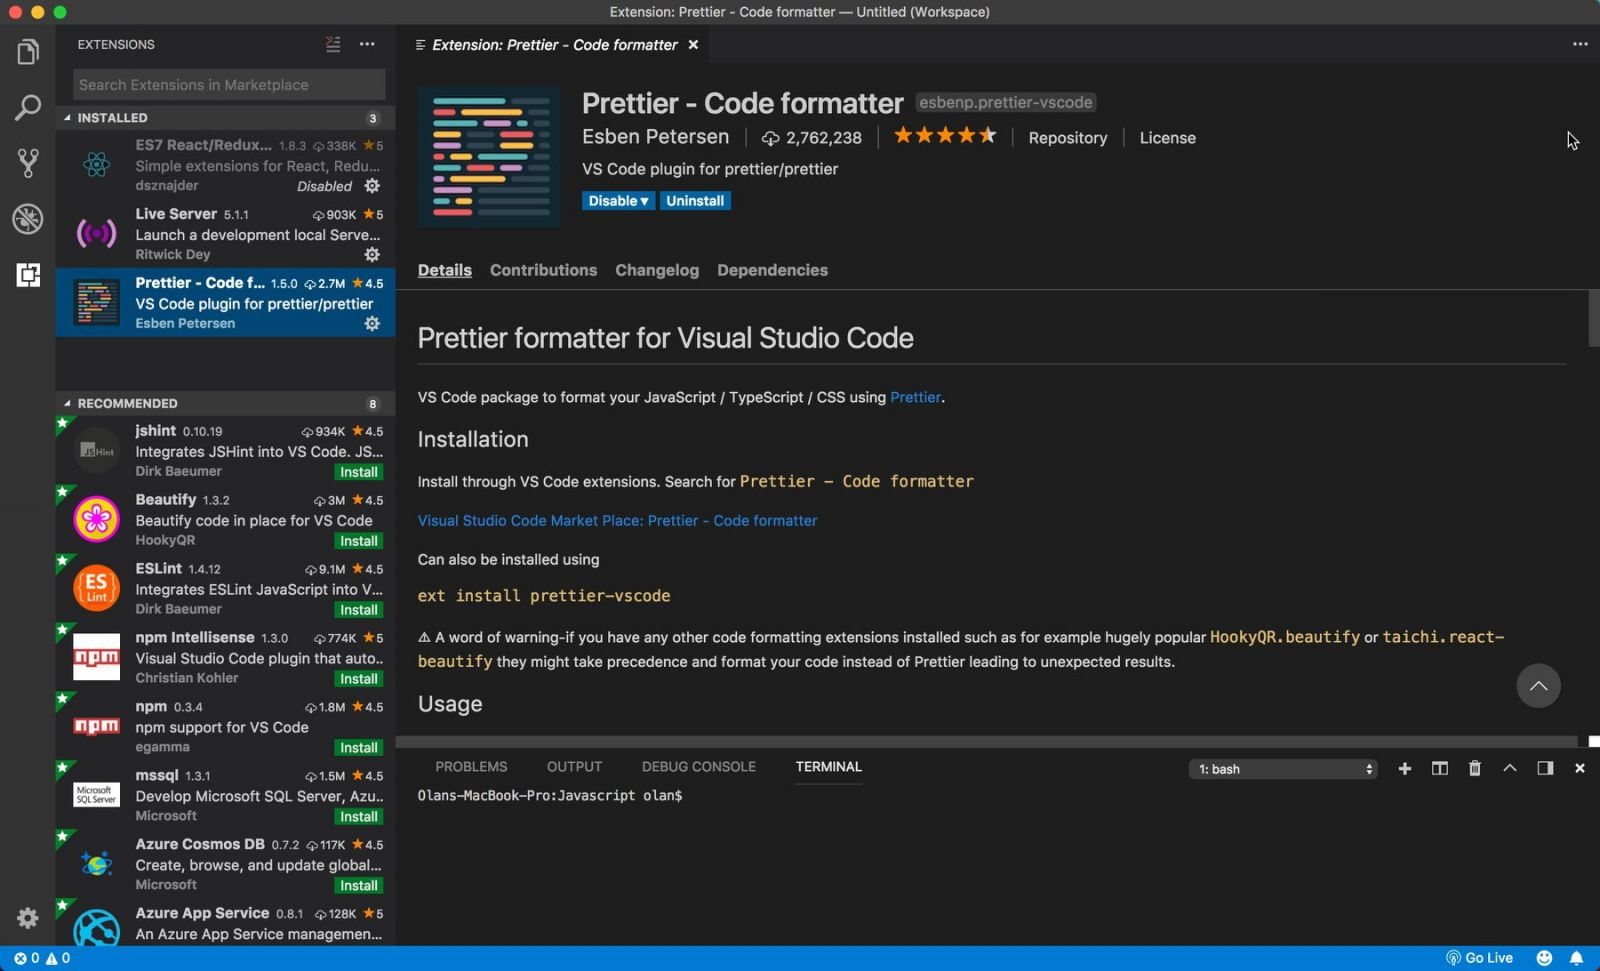 5 Extension สุดเจ๋ง ใน Visual Studio Code | School